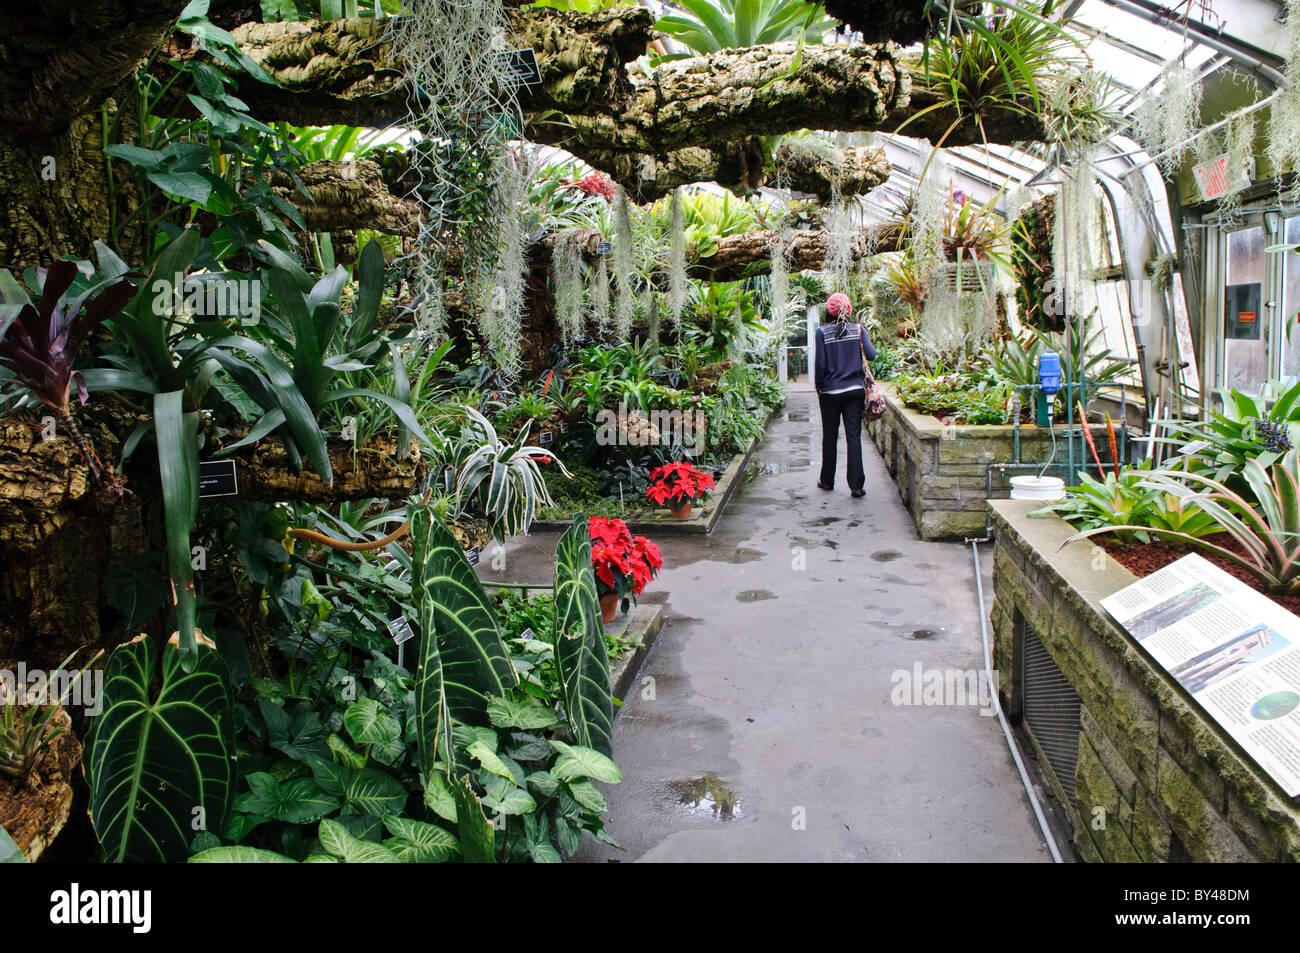 Inside montreal 39 s botanical garden one of the world 39 s for Indoor botanical gardens